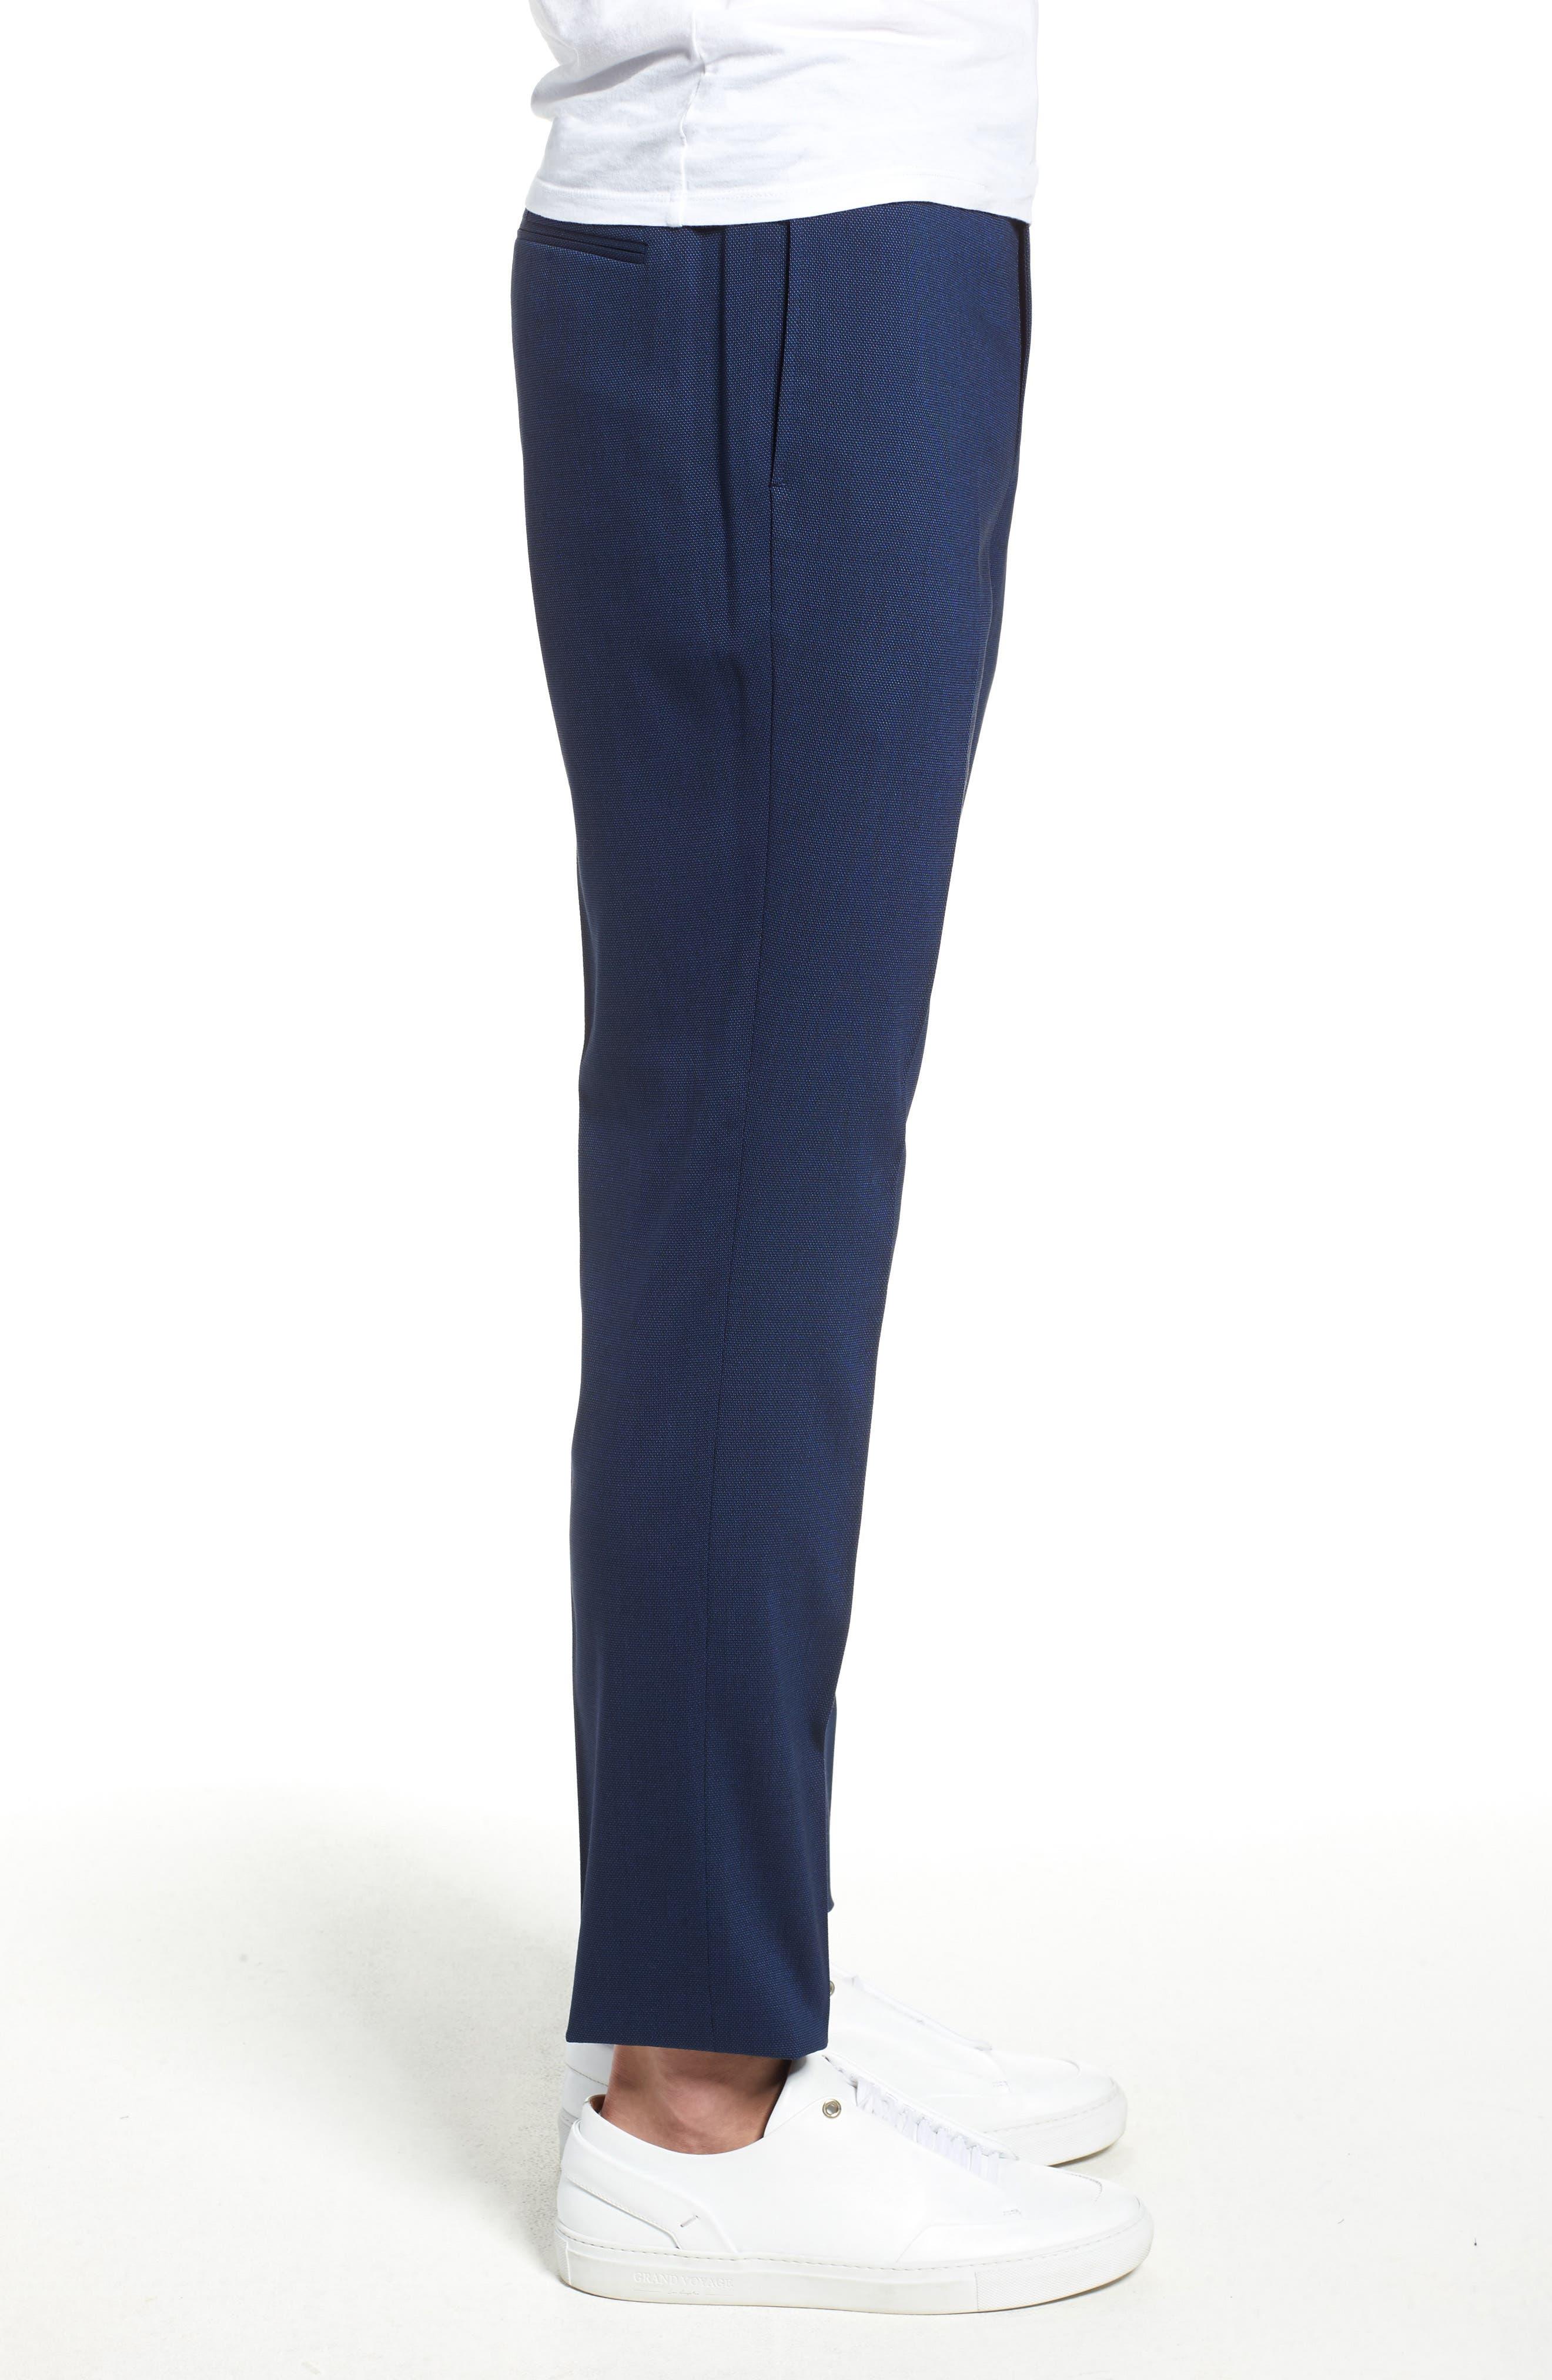 TOPMAN, Skinny Fit Suit Pants, Alternate thumbnail 3, color, MID BLUE